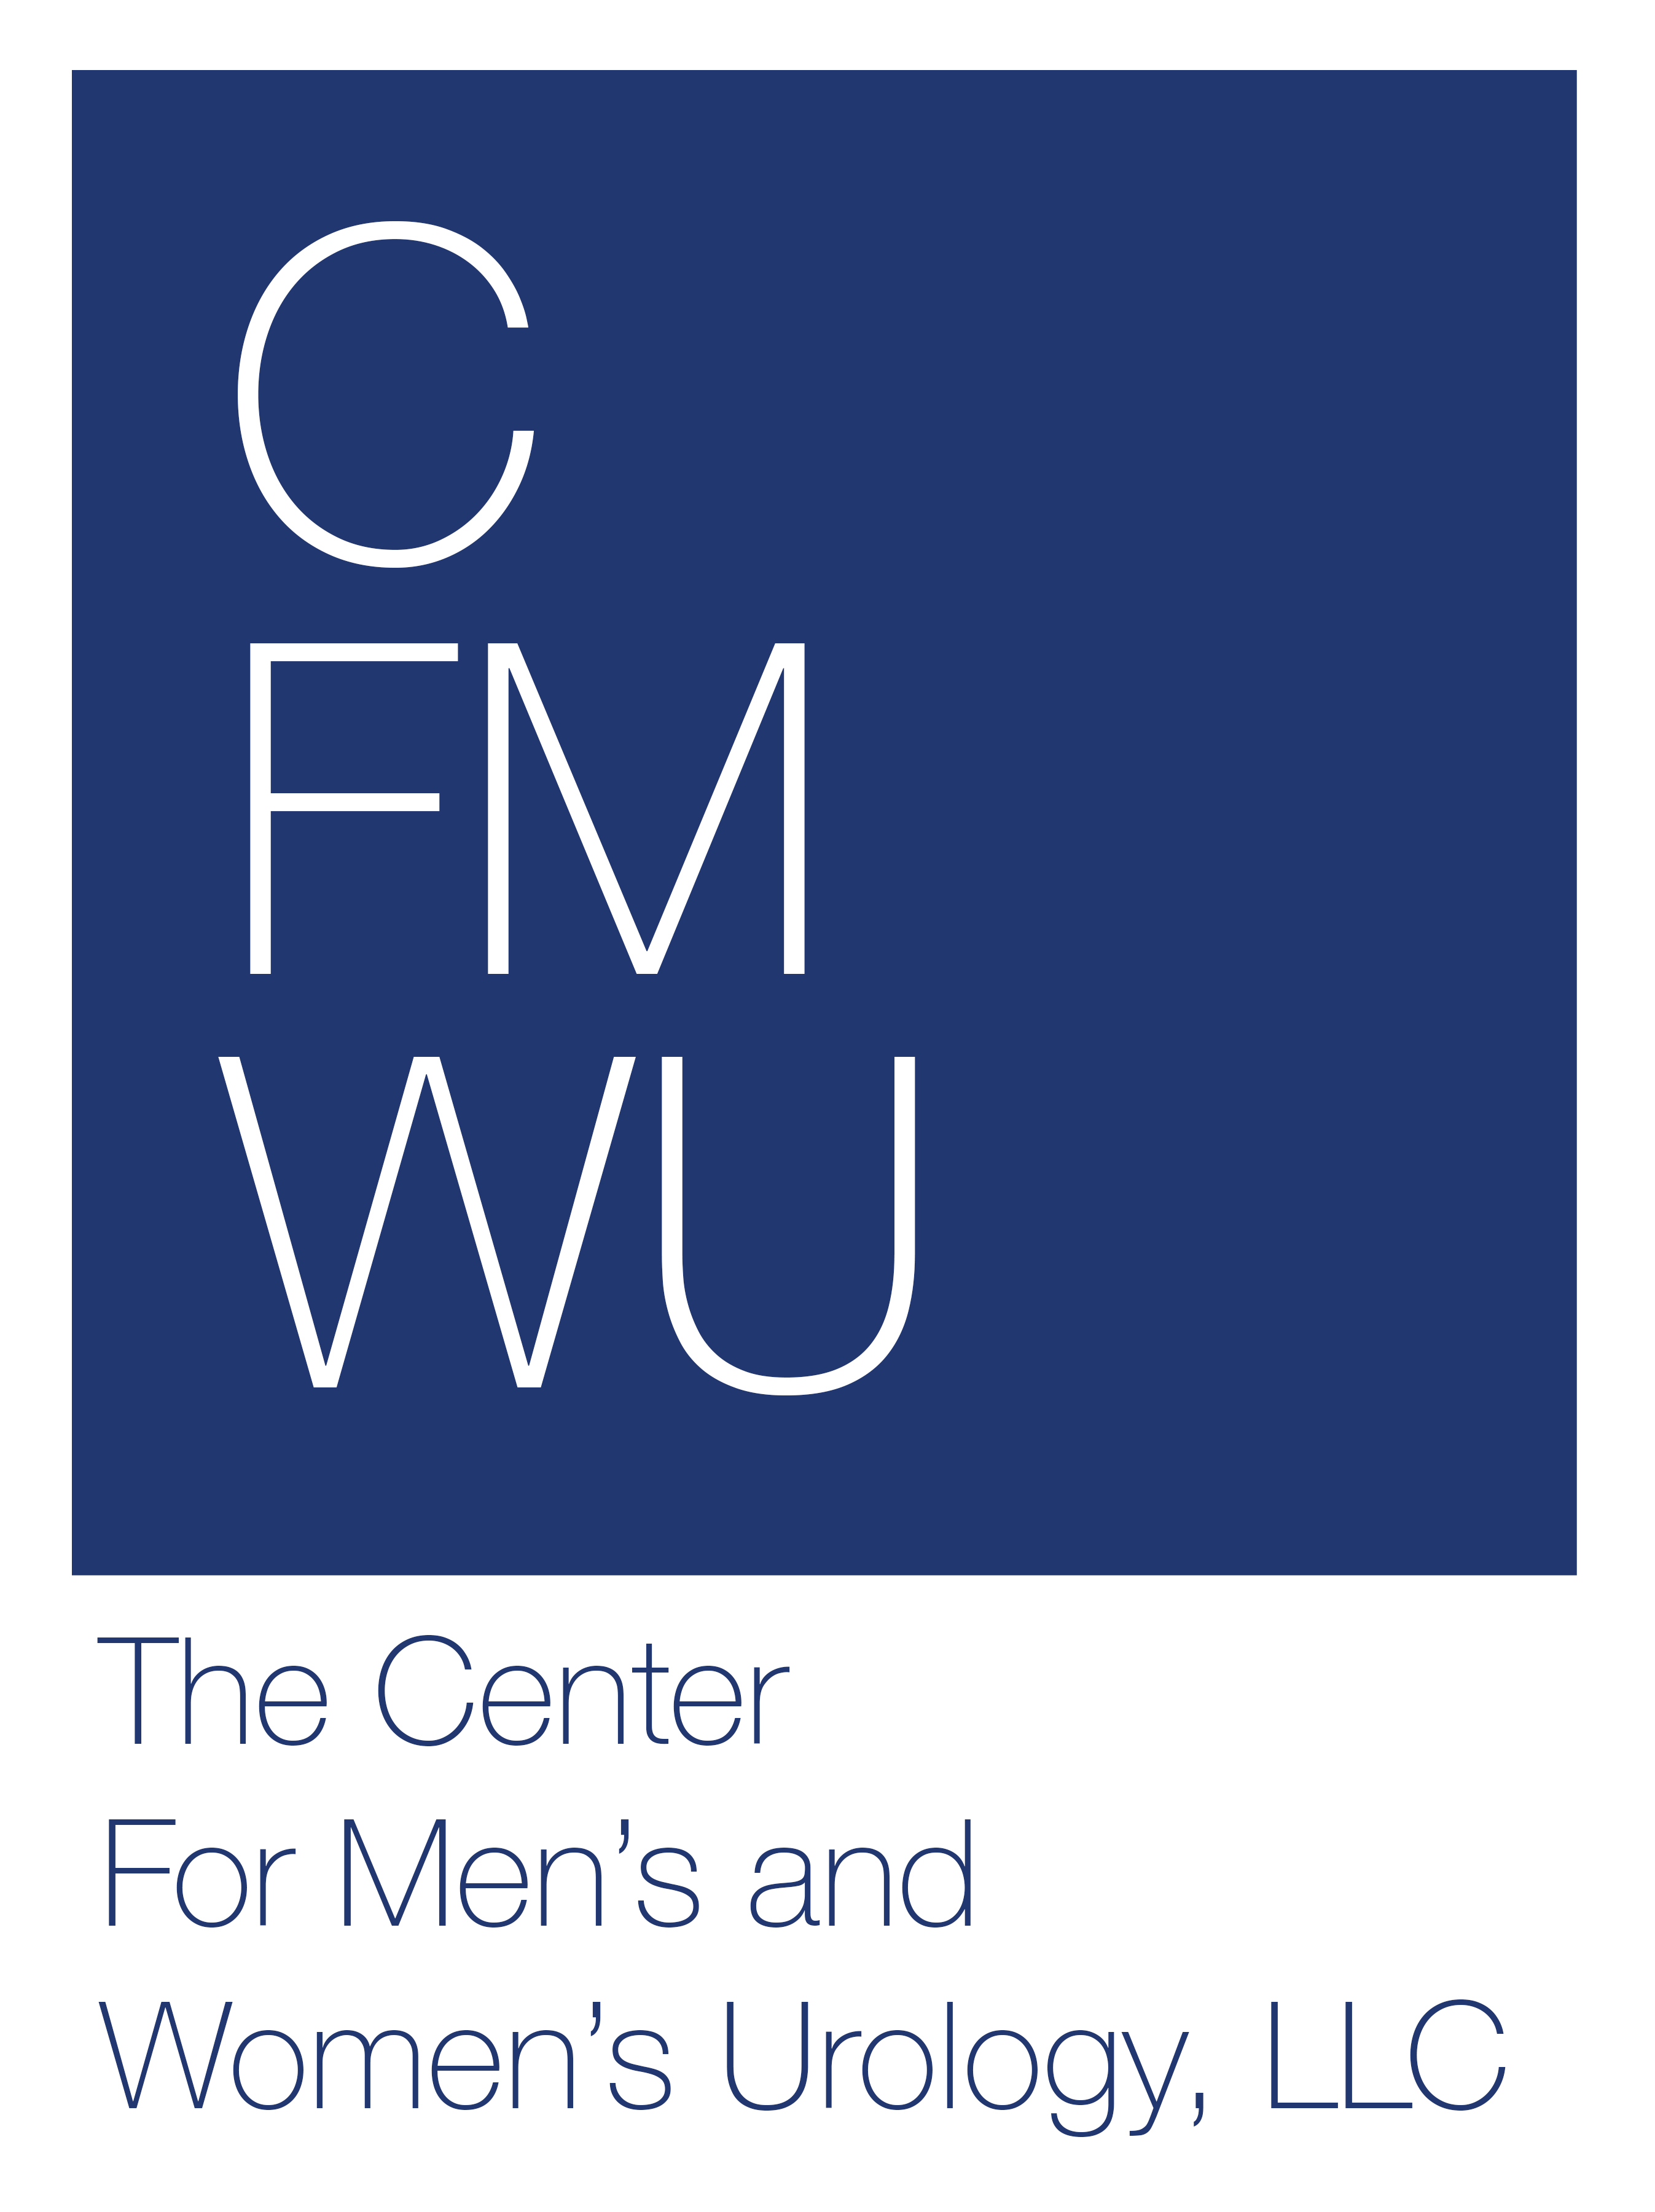 Center for Men's and Women's Urology LLC